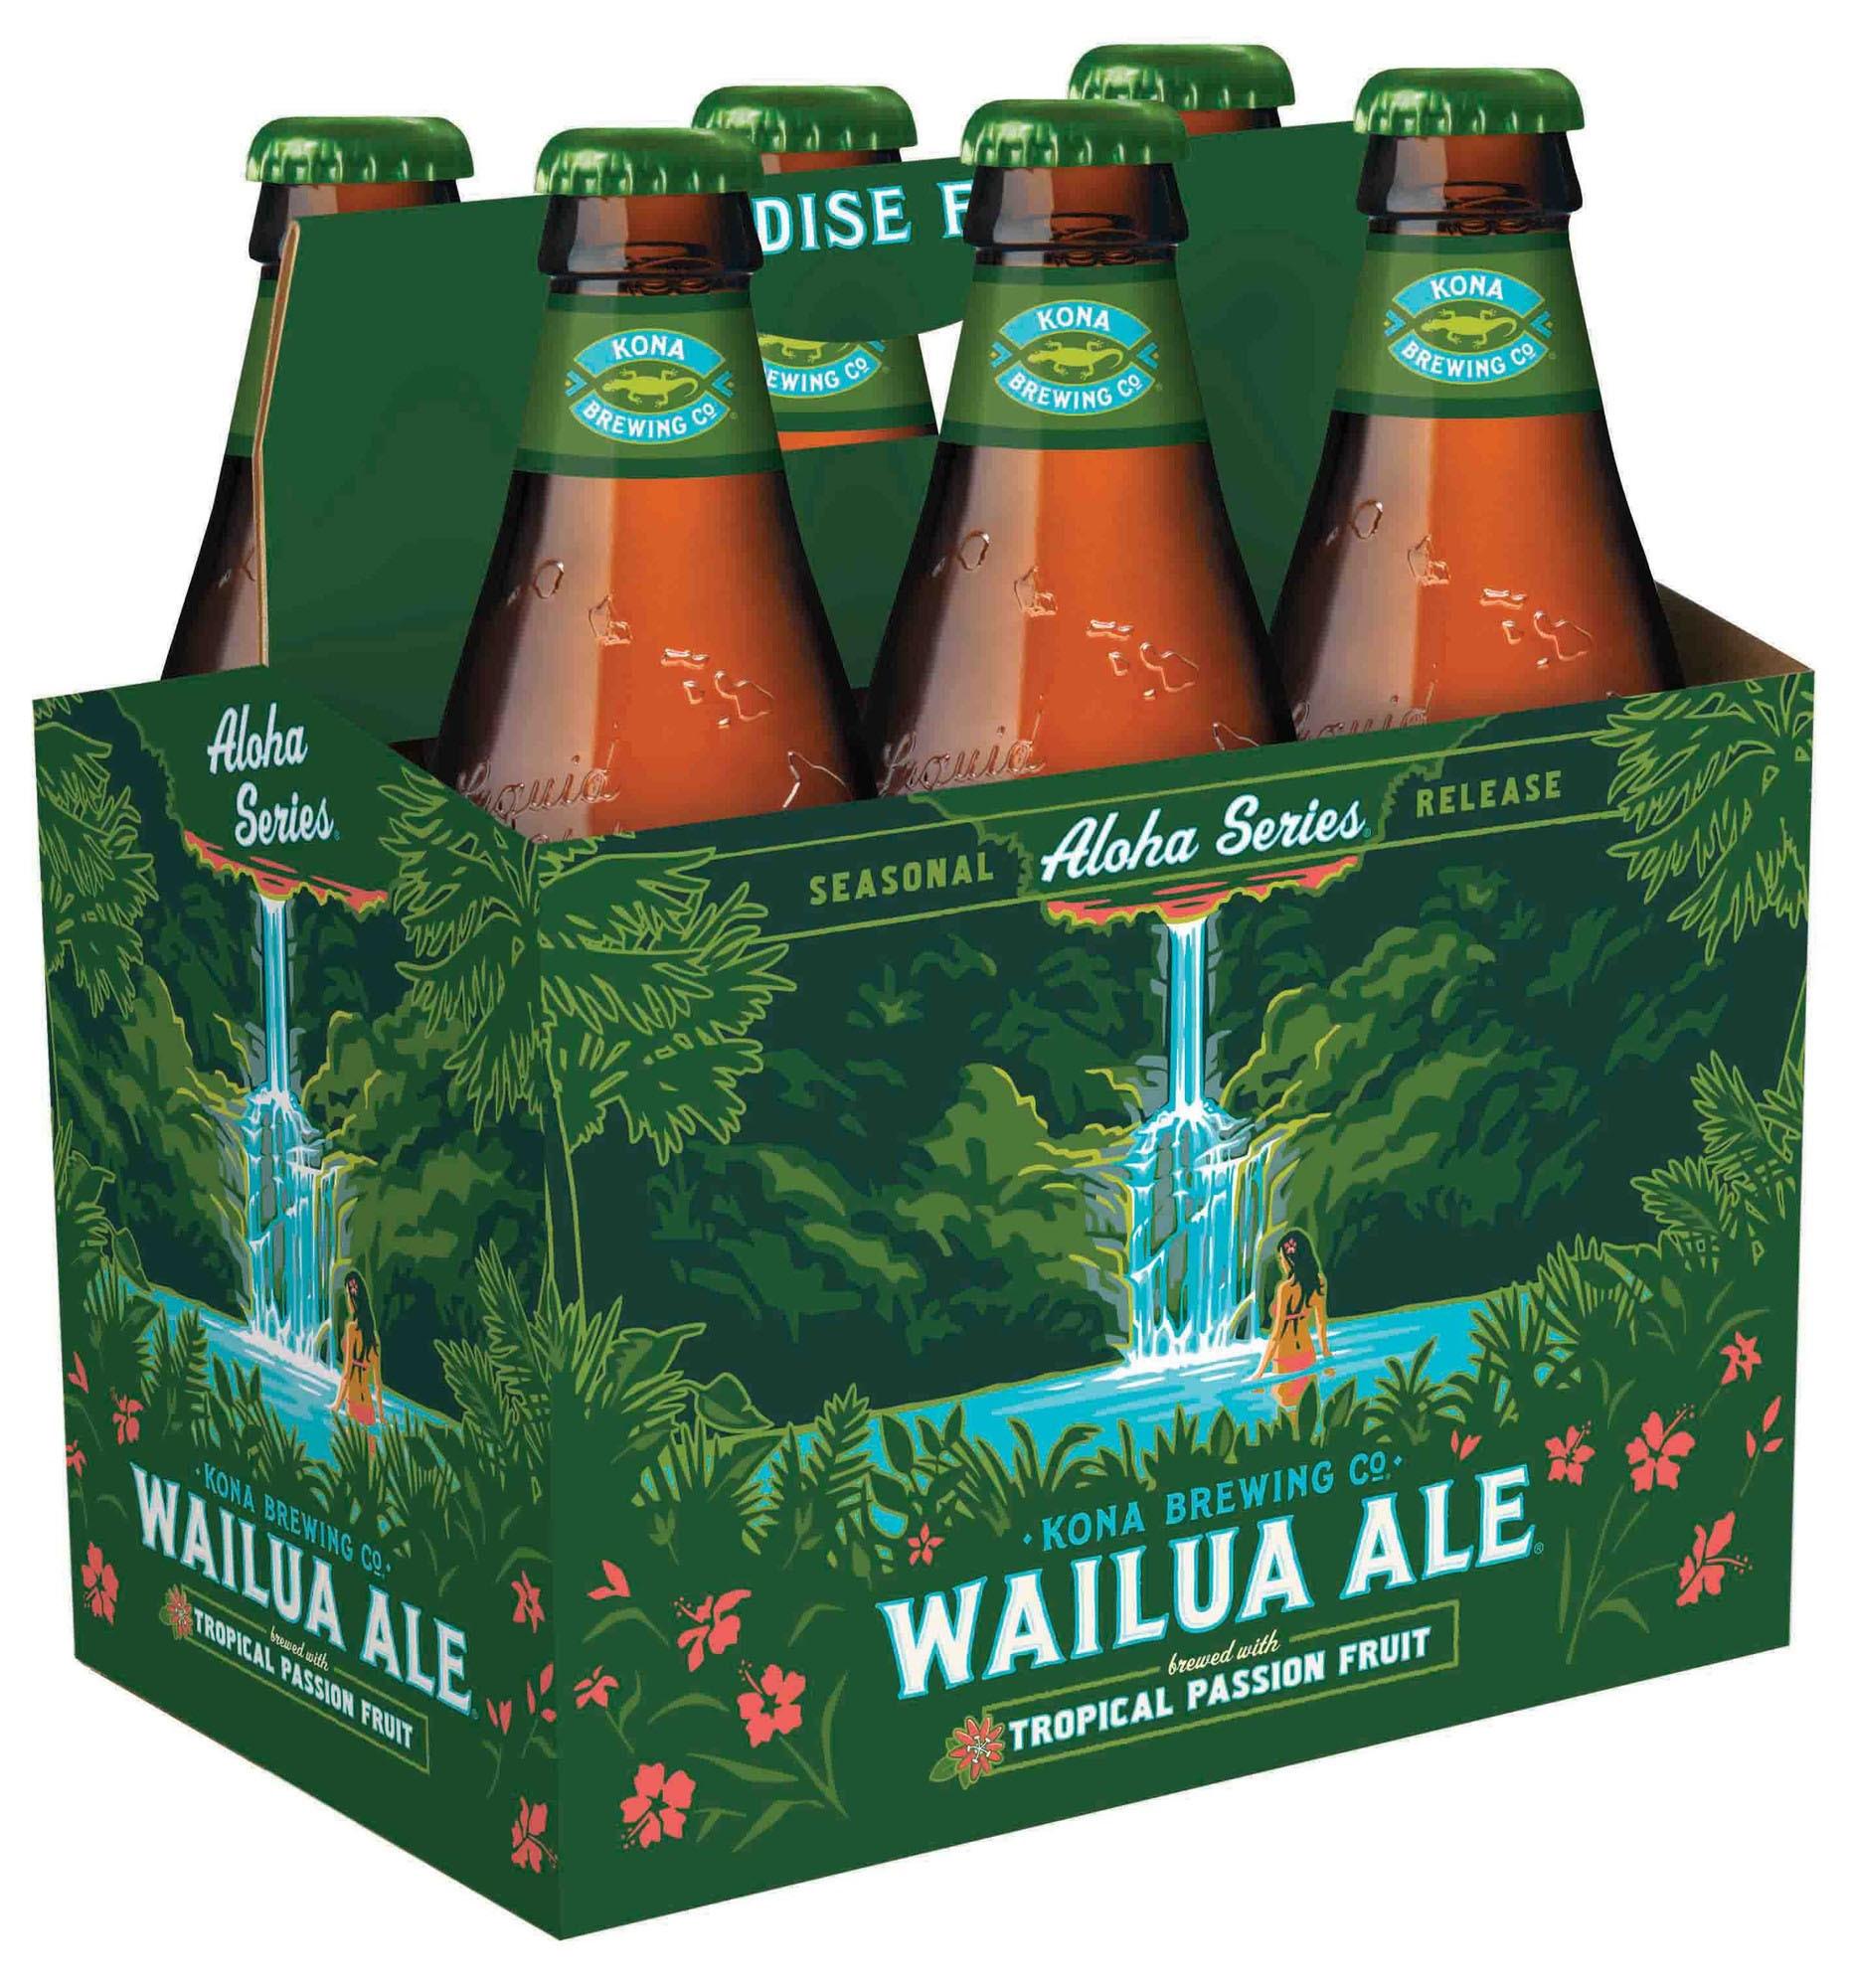 Kona Brewing Co.'s 'Taste of Summer' Wailua Return With New Look